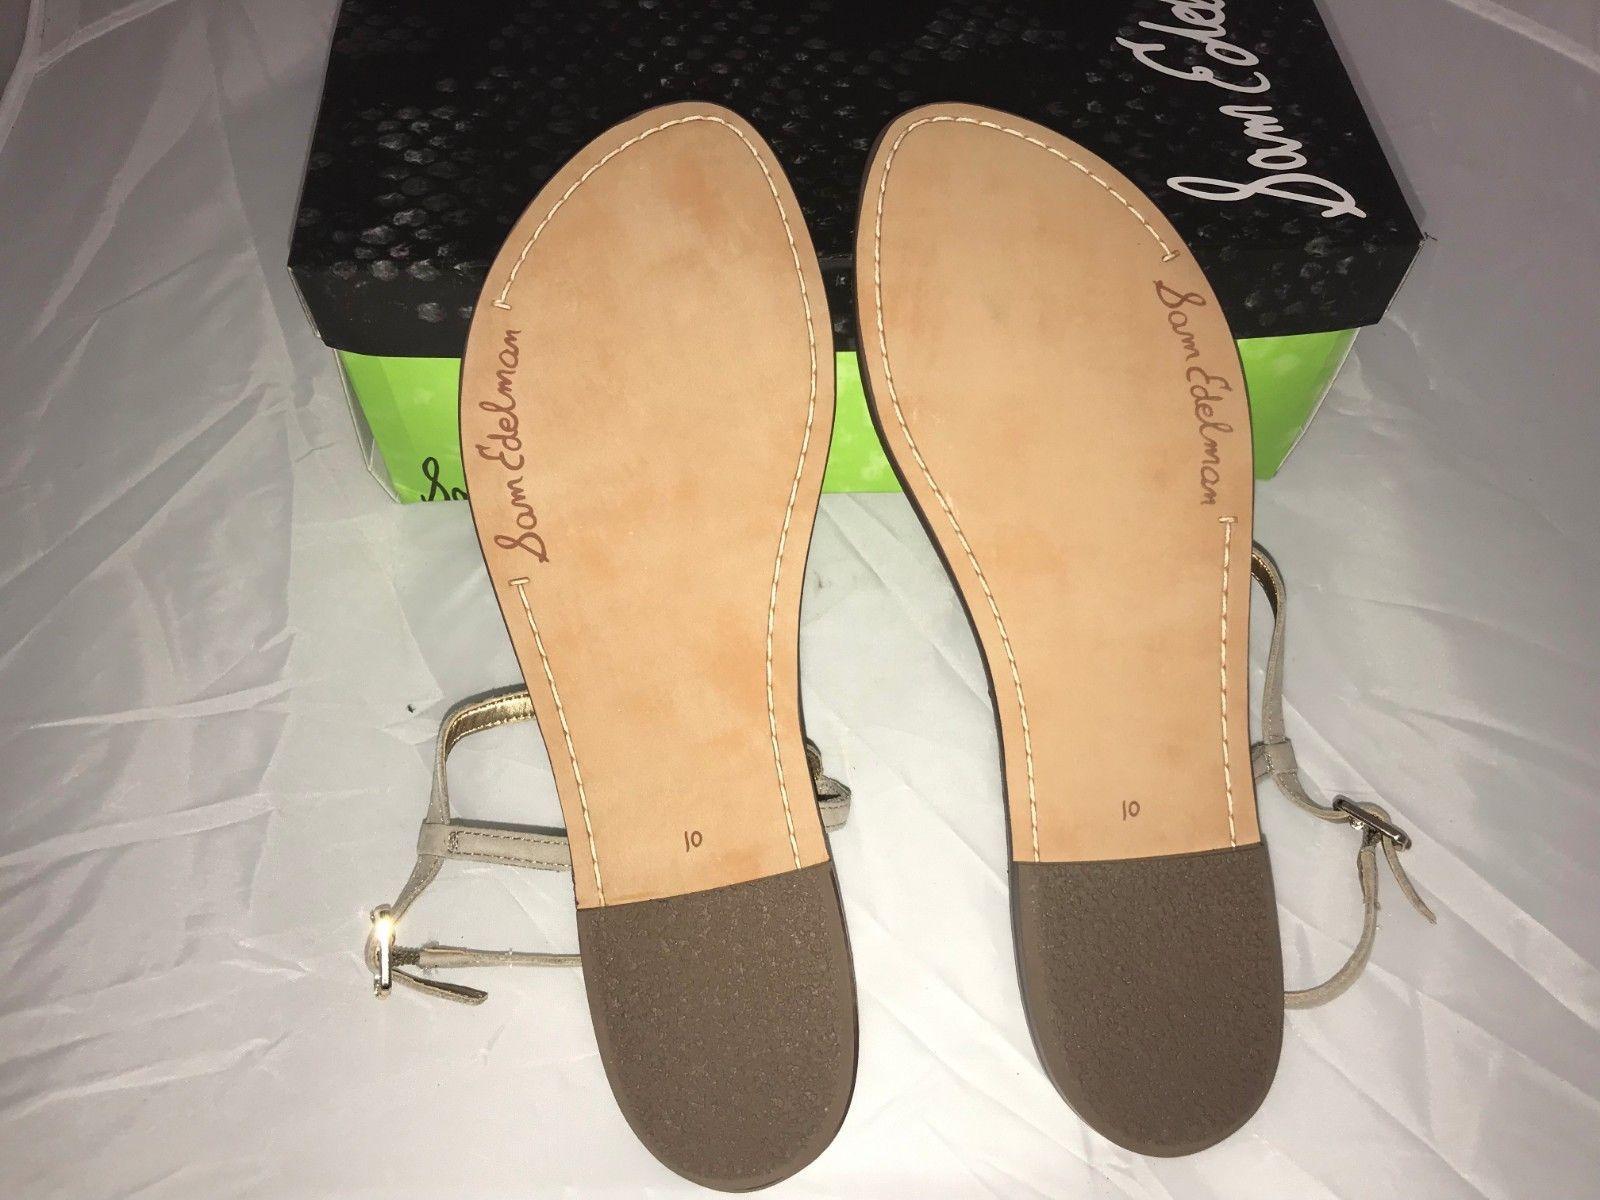 0851531e6 Sam Edelman Gig Bright multi strip thong sandal womens size 10